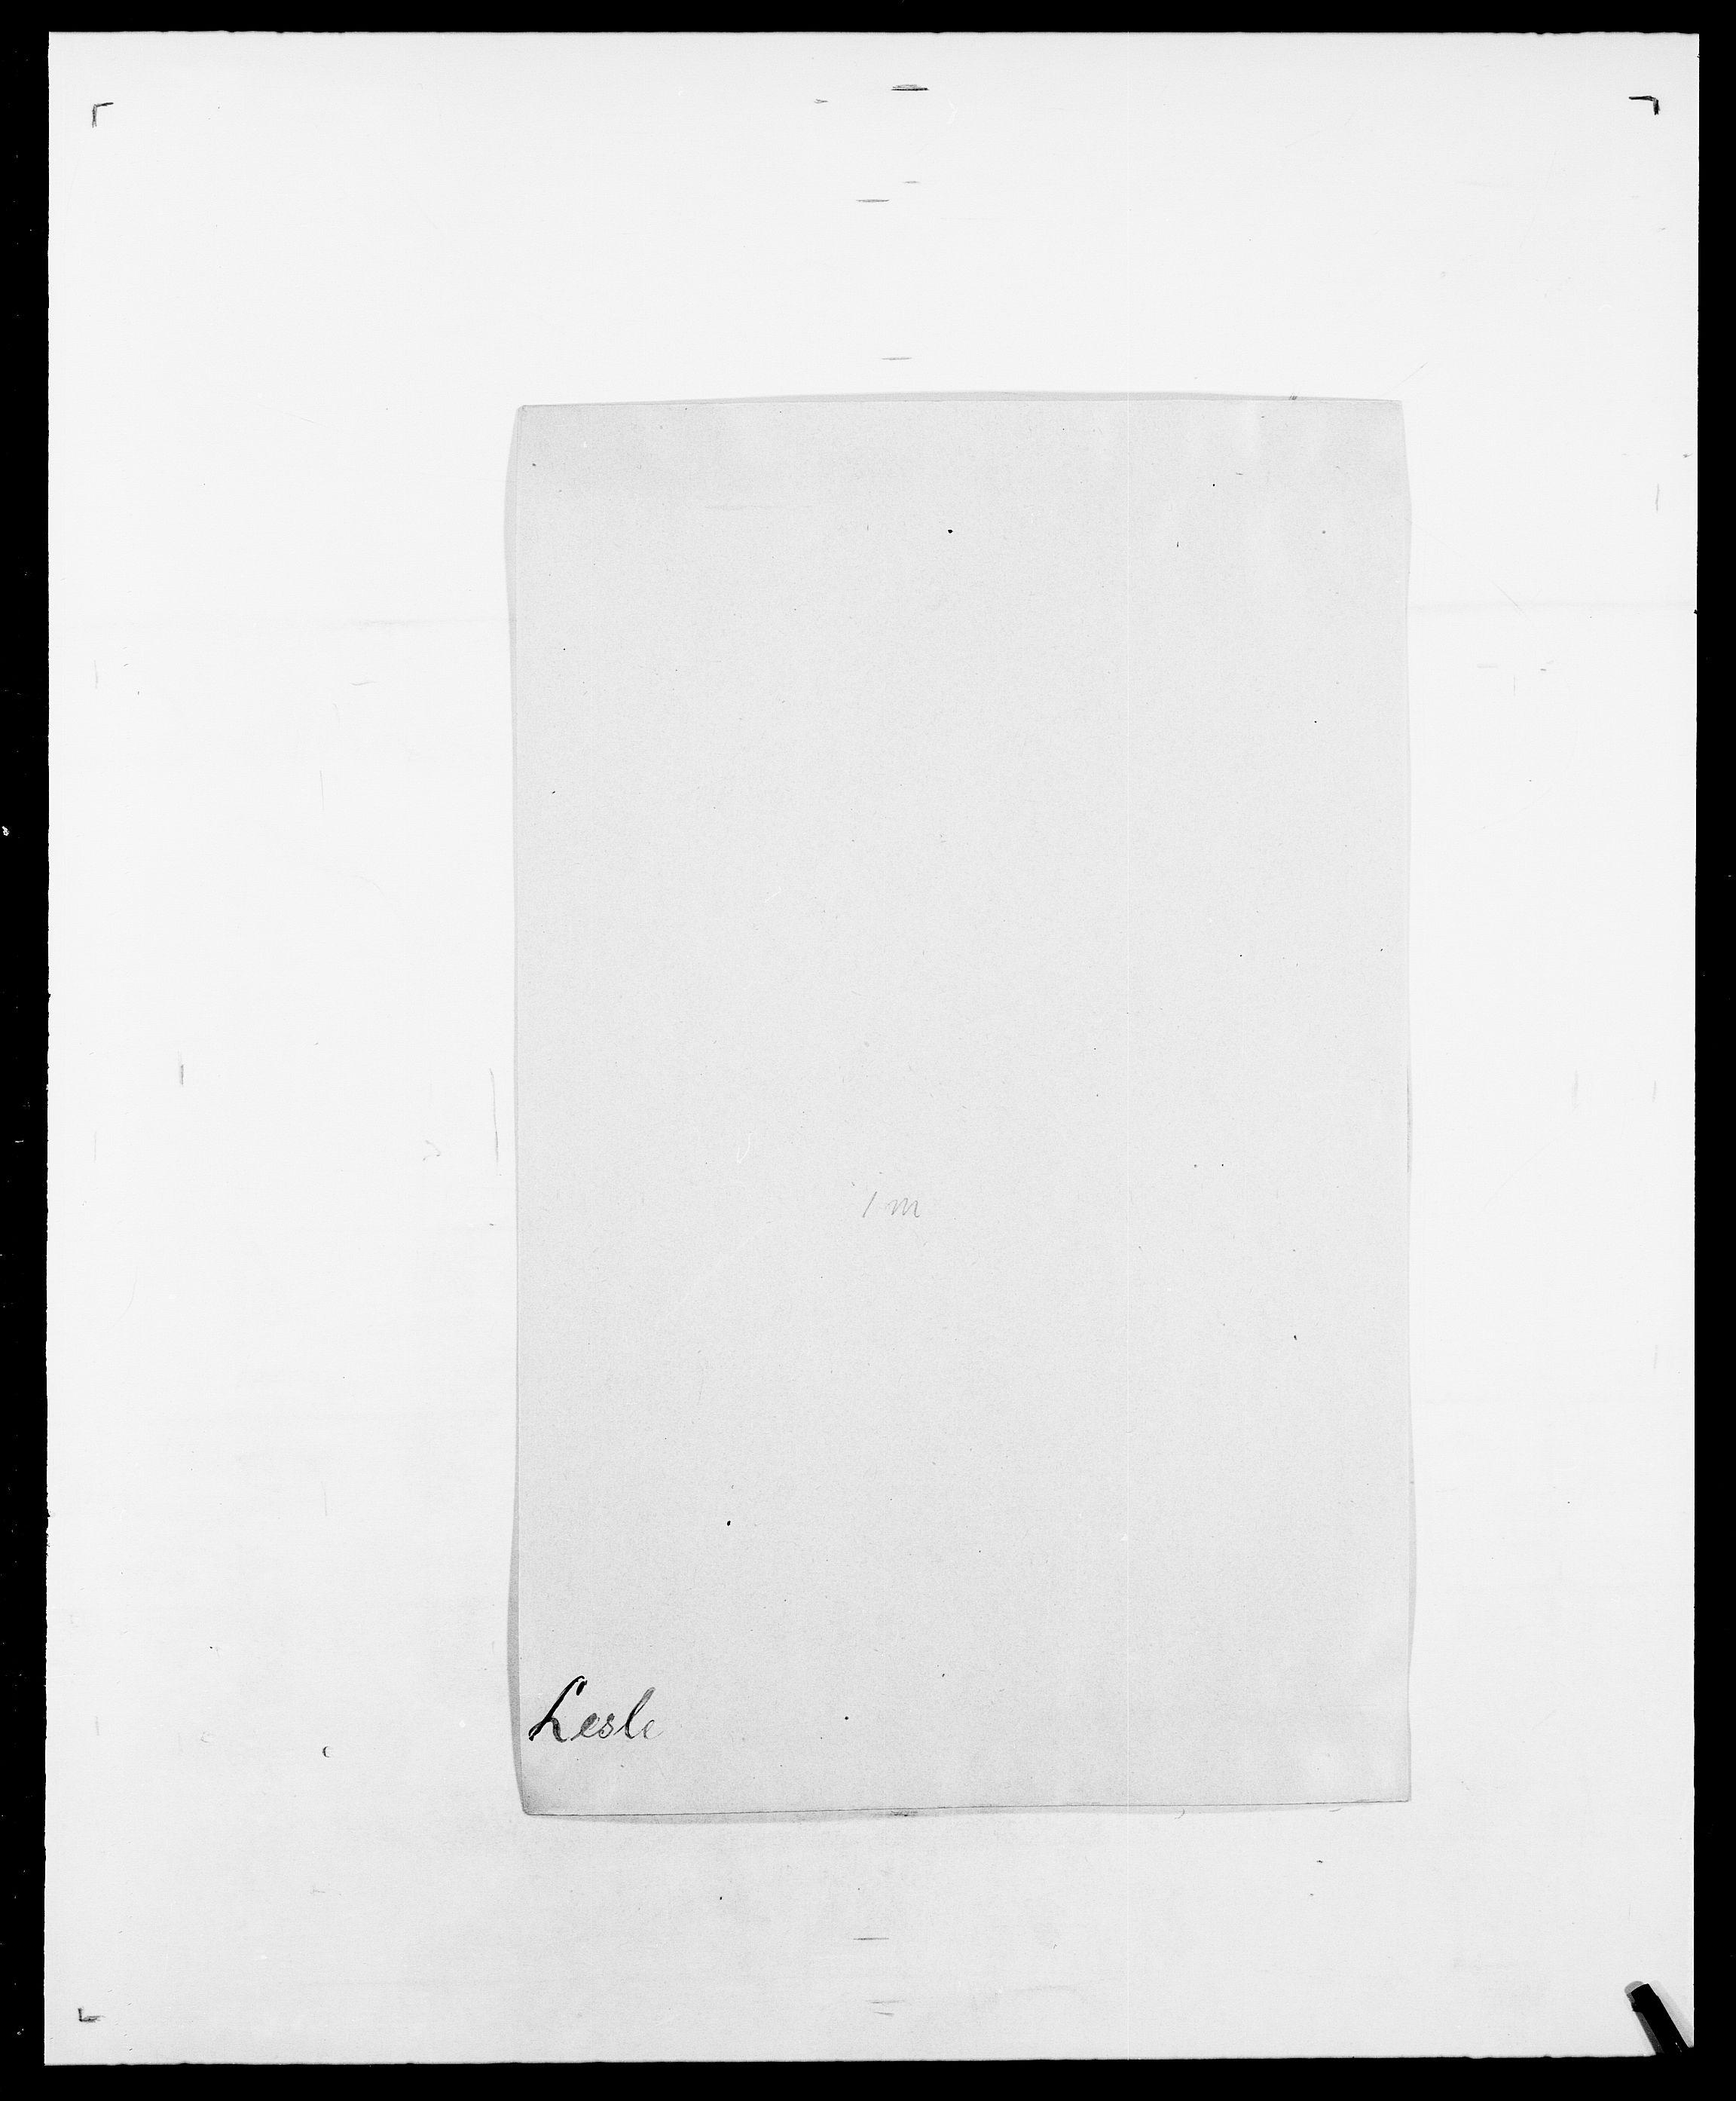 SAO, Delgobe, Charles Antoine - samling, D/Da/L0023: Lau - Lirvyn, s. 251